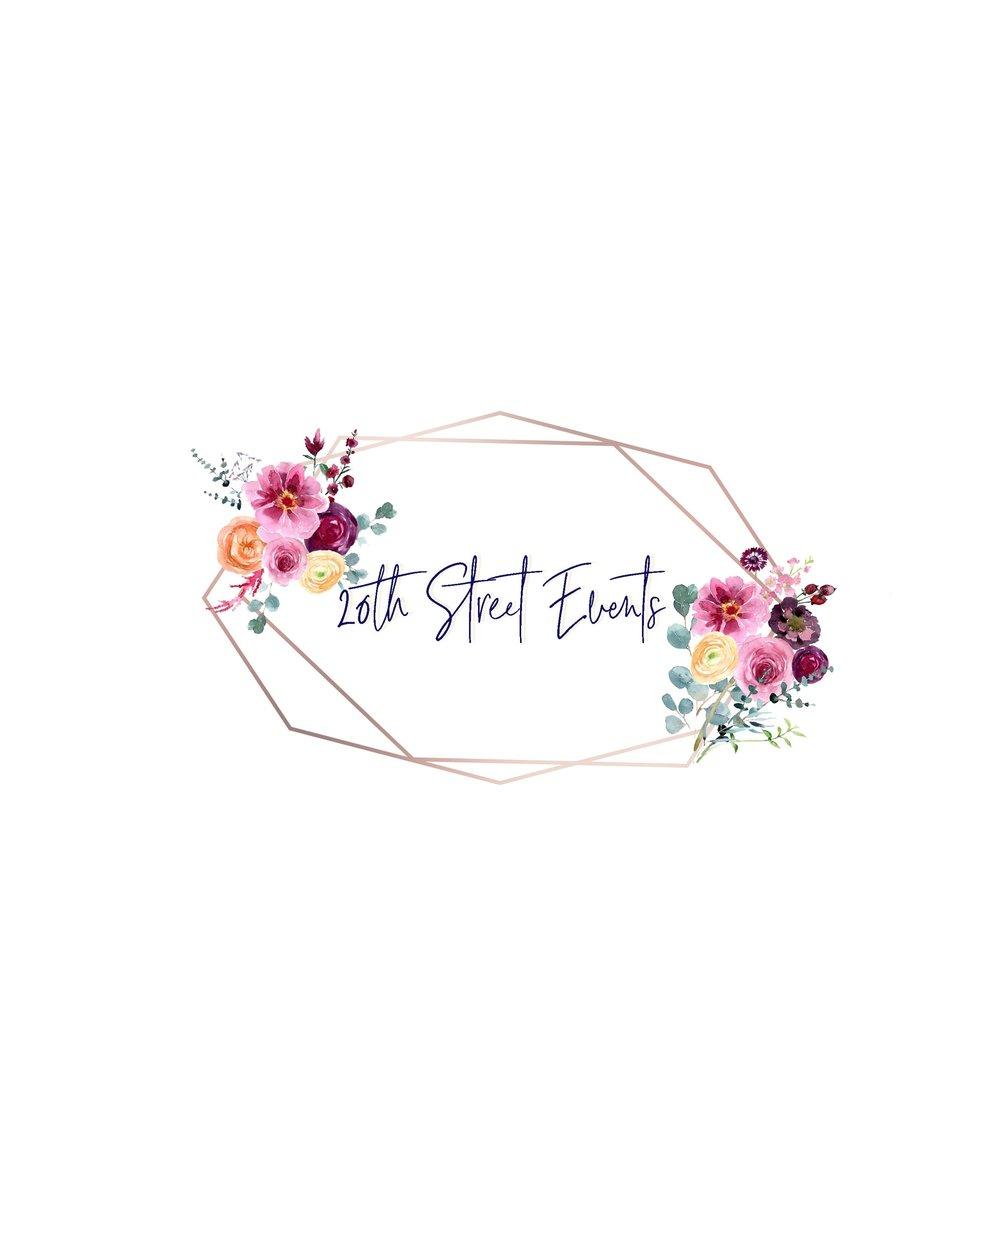 shaina logo final floral.jpg